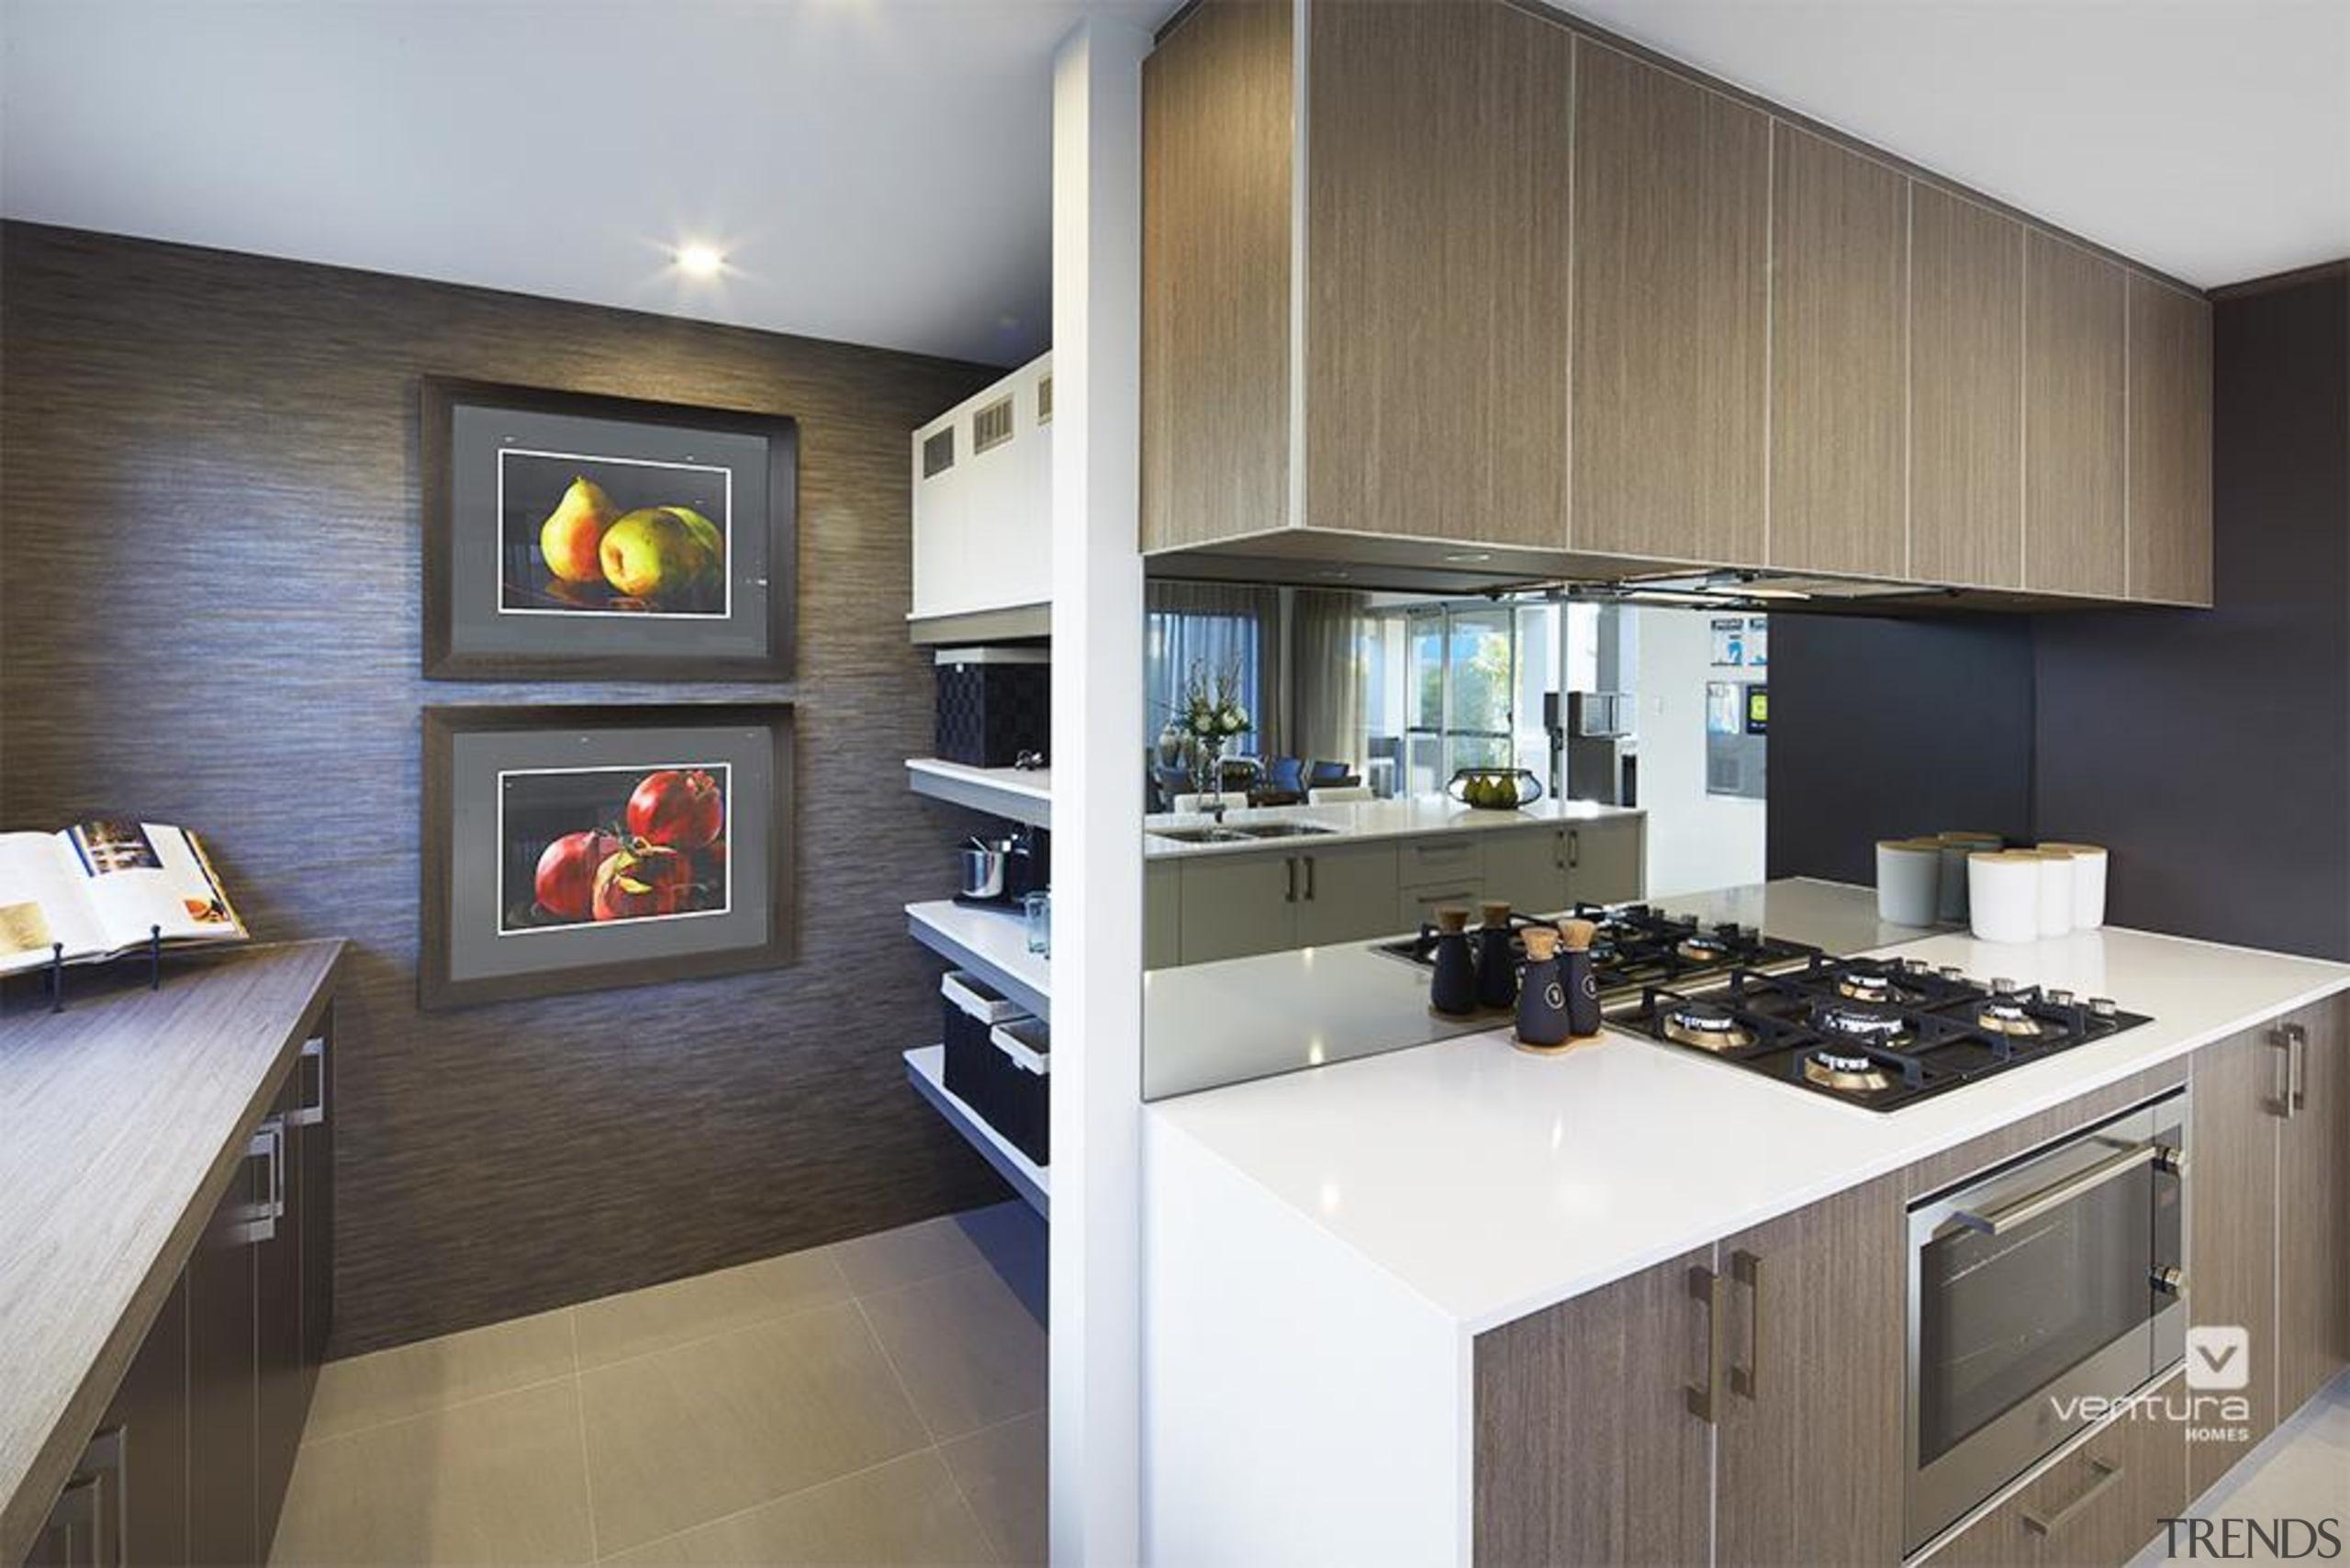 Kitchen design. - The Lexington Two Storey Display countertop, cuisine classique, home appliance, interior design, kitchen, white, gray